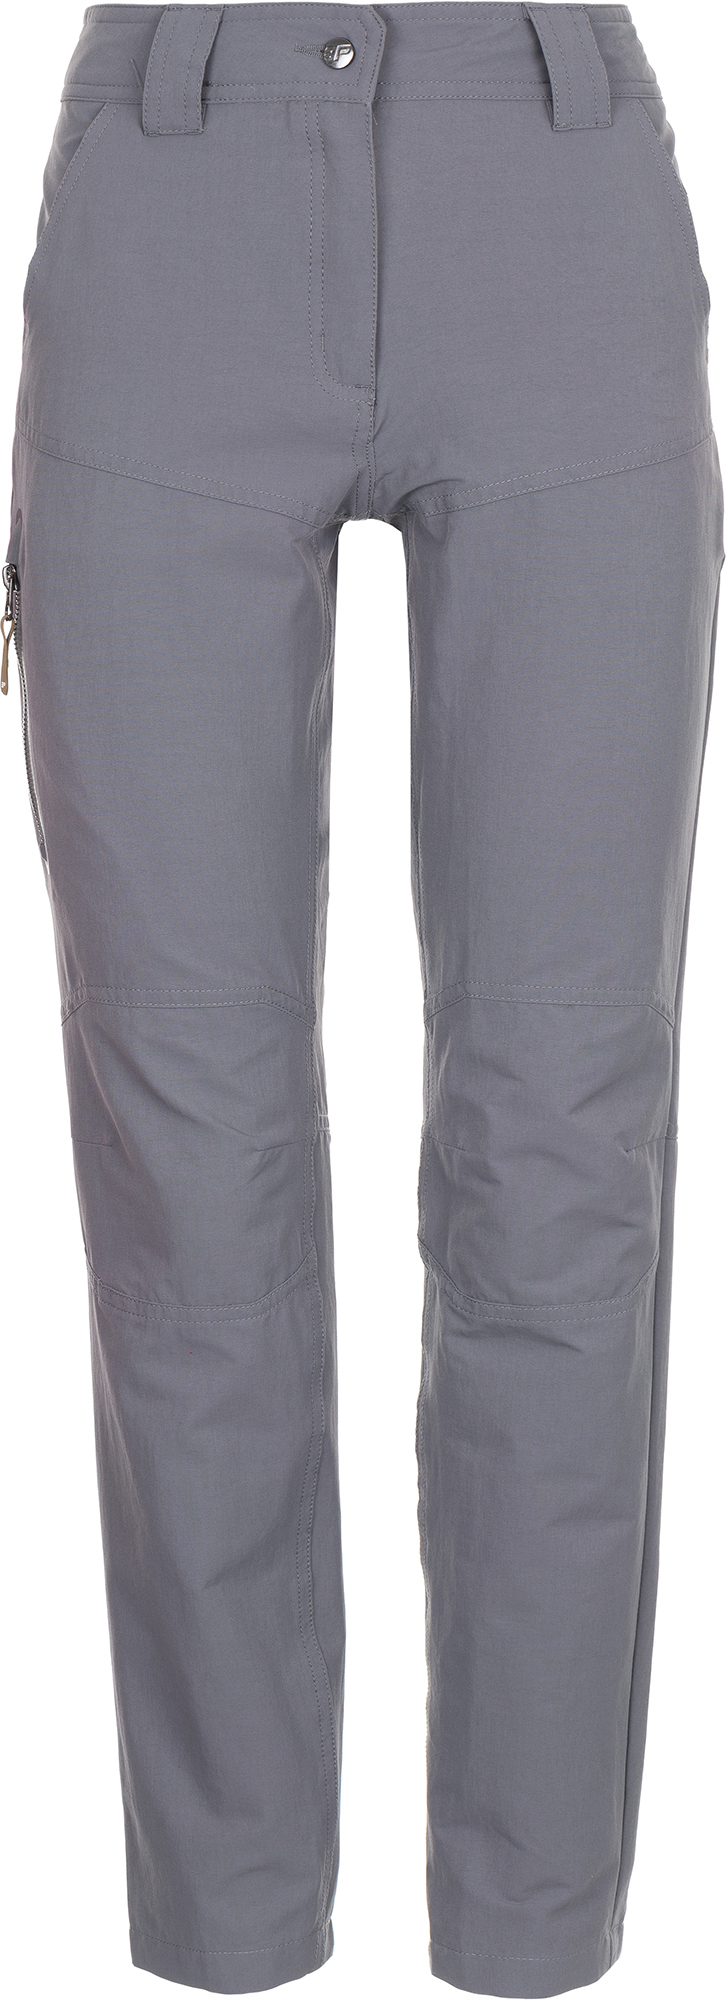 IcePeak Брюки женские IcePeak Lenita брюки женские icepeak savita цвет темно синий 654020542iv размер 46 52